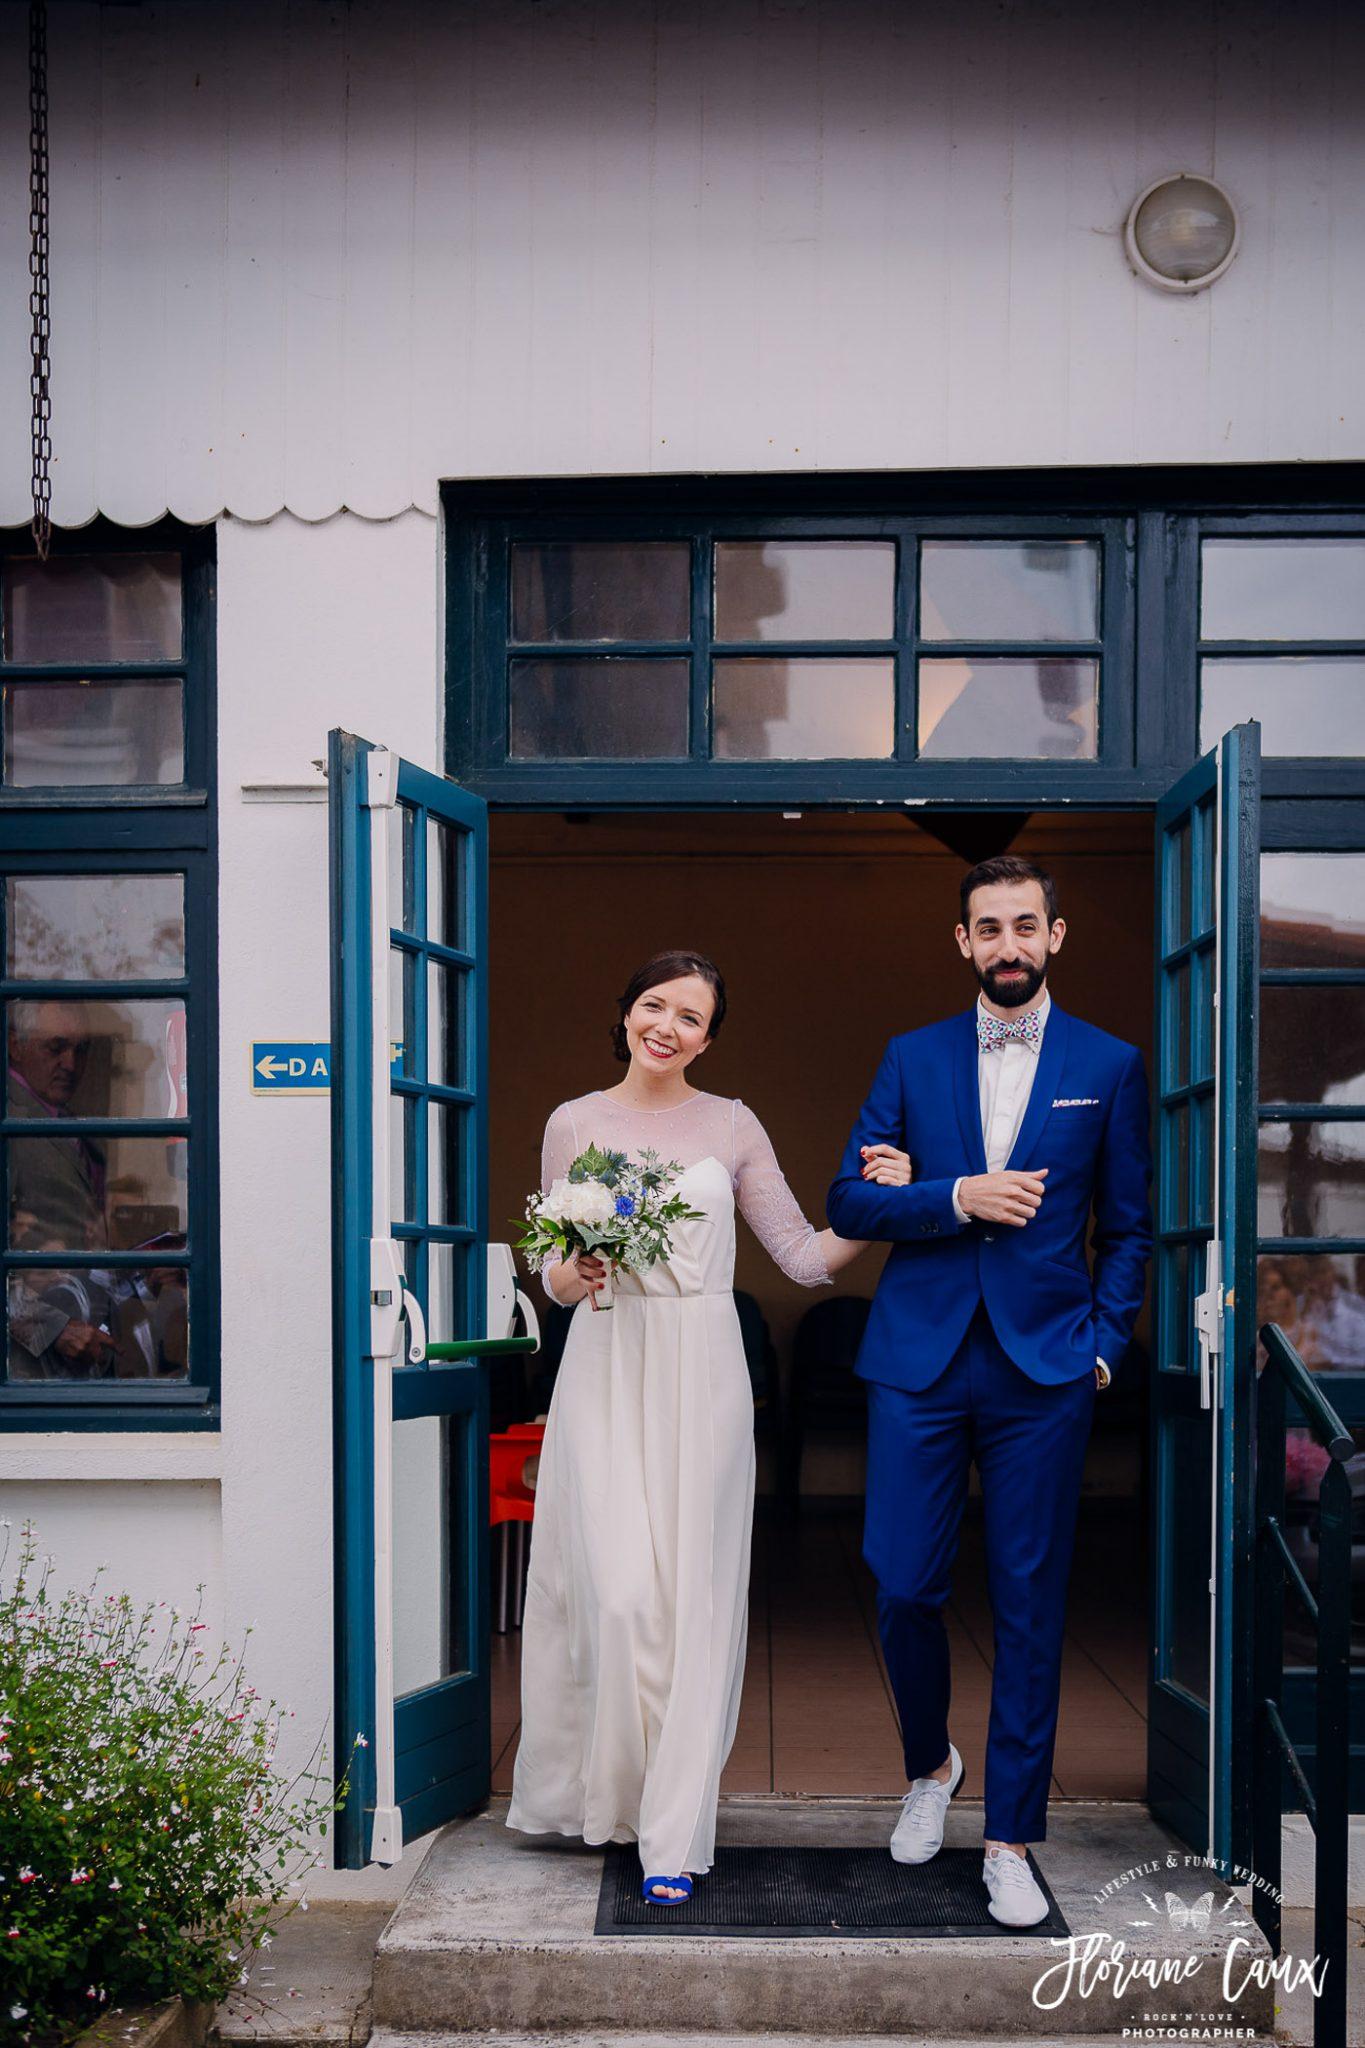 photographe-mariage-pays-basque-Floriane-Caux (21)